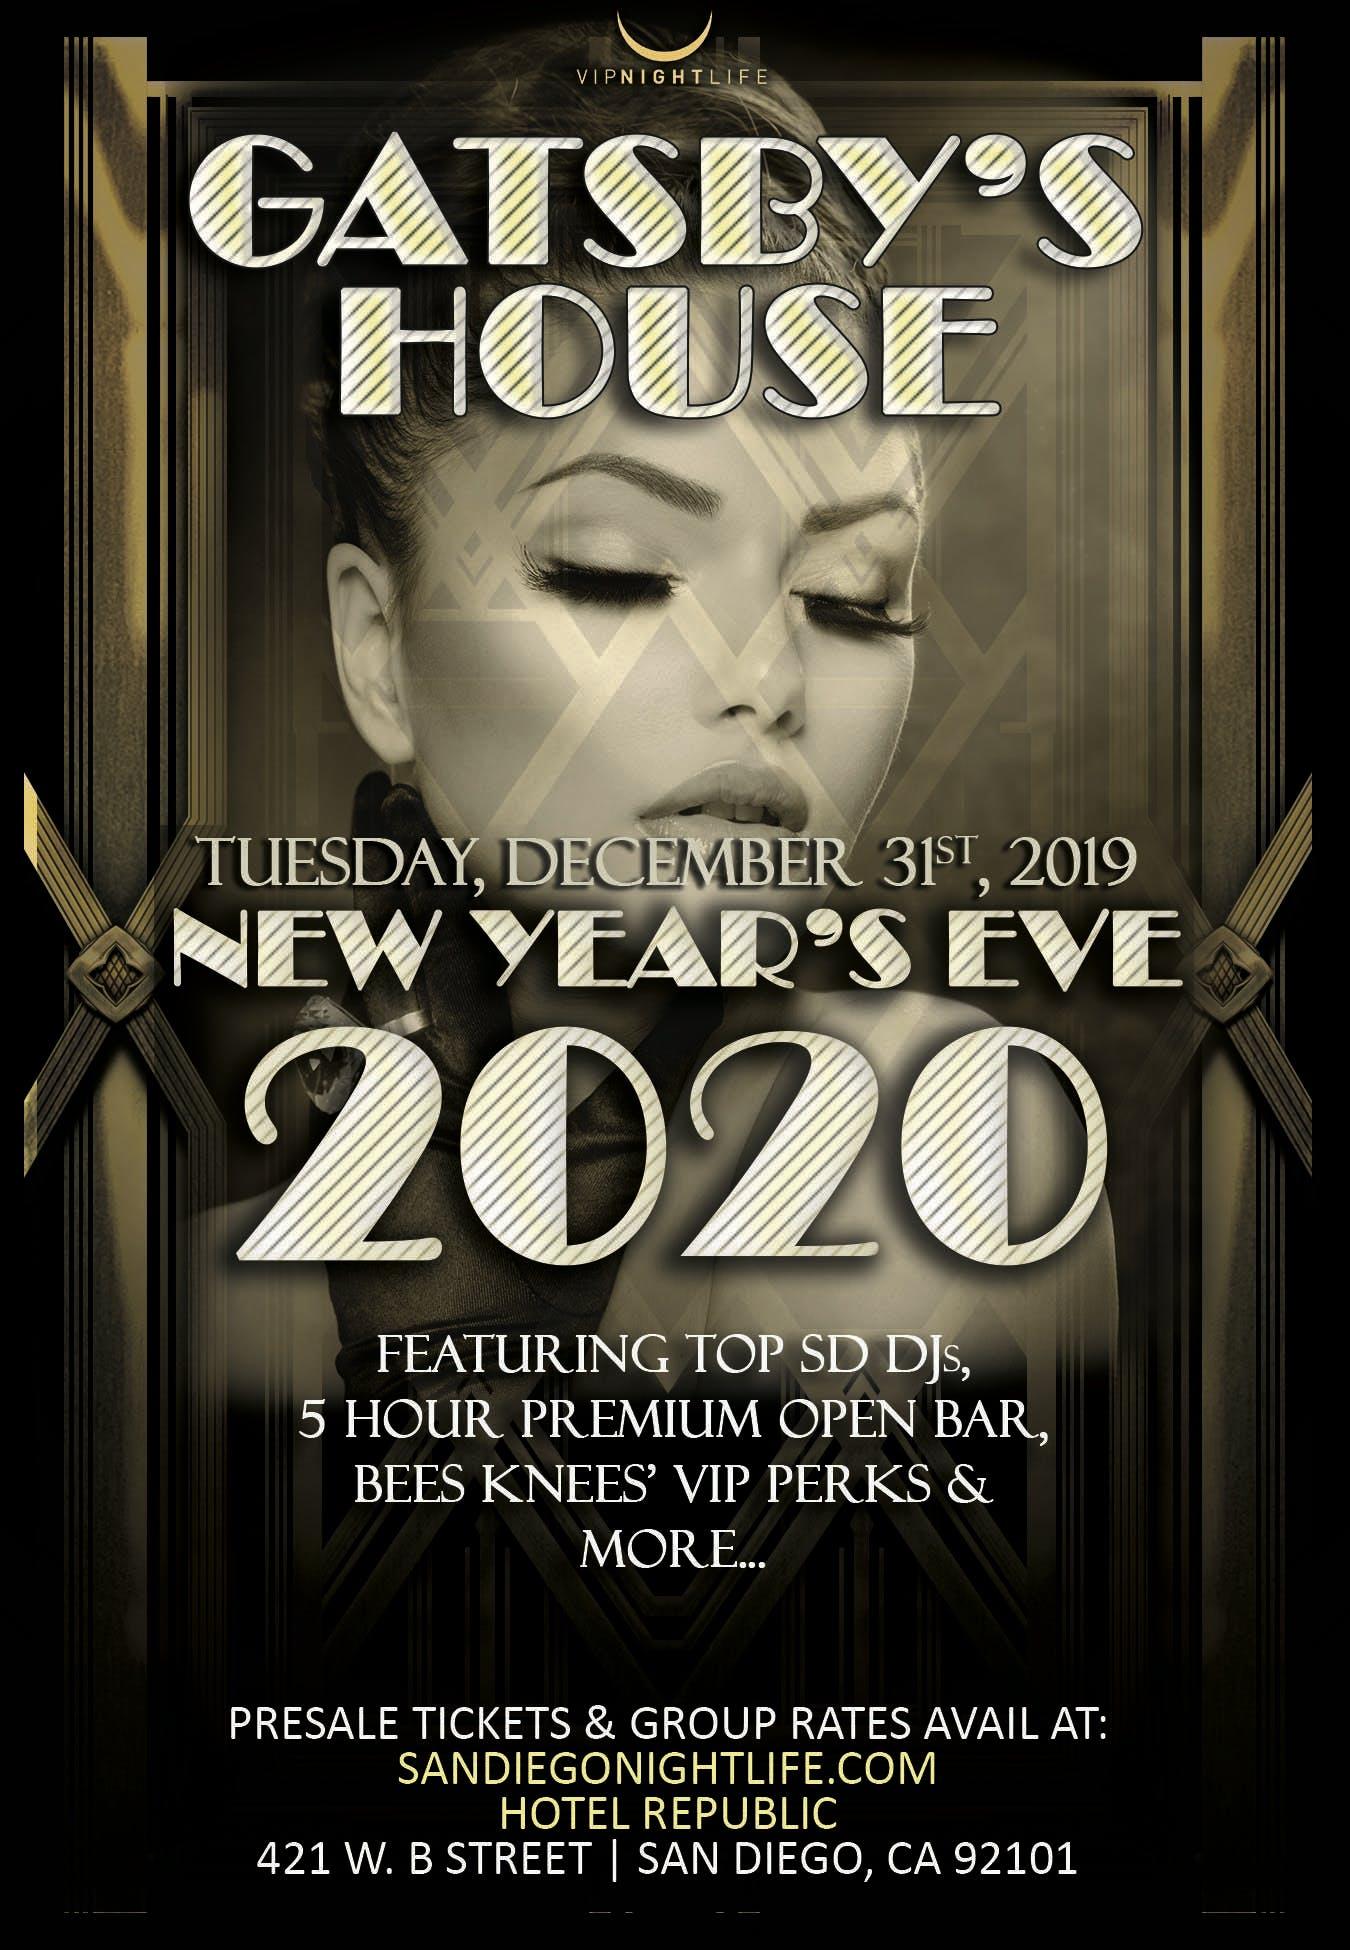 San Antonio New Years Eve 2020.Gatsbys House San Diego New Years Eve 2020 At Hotel